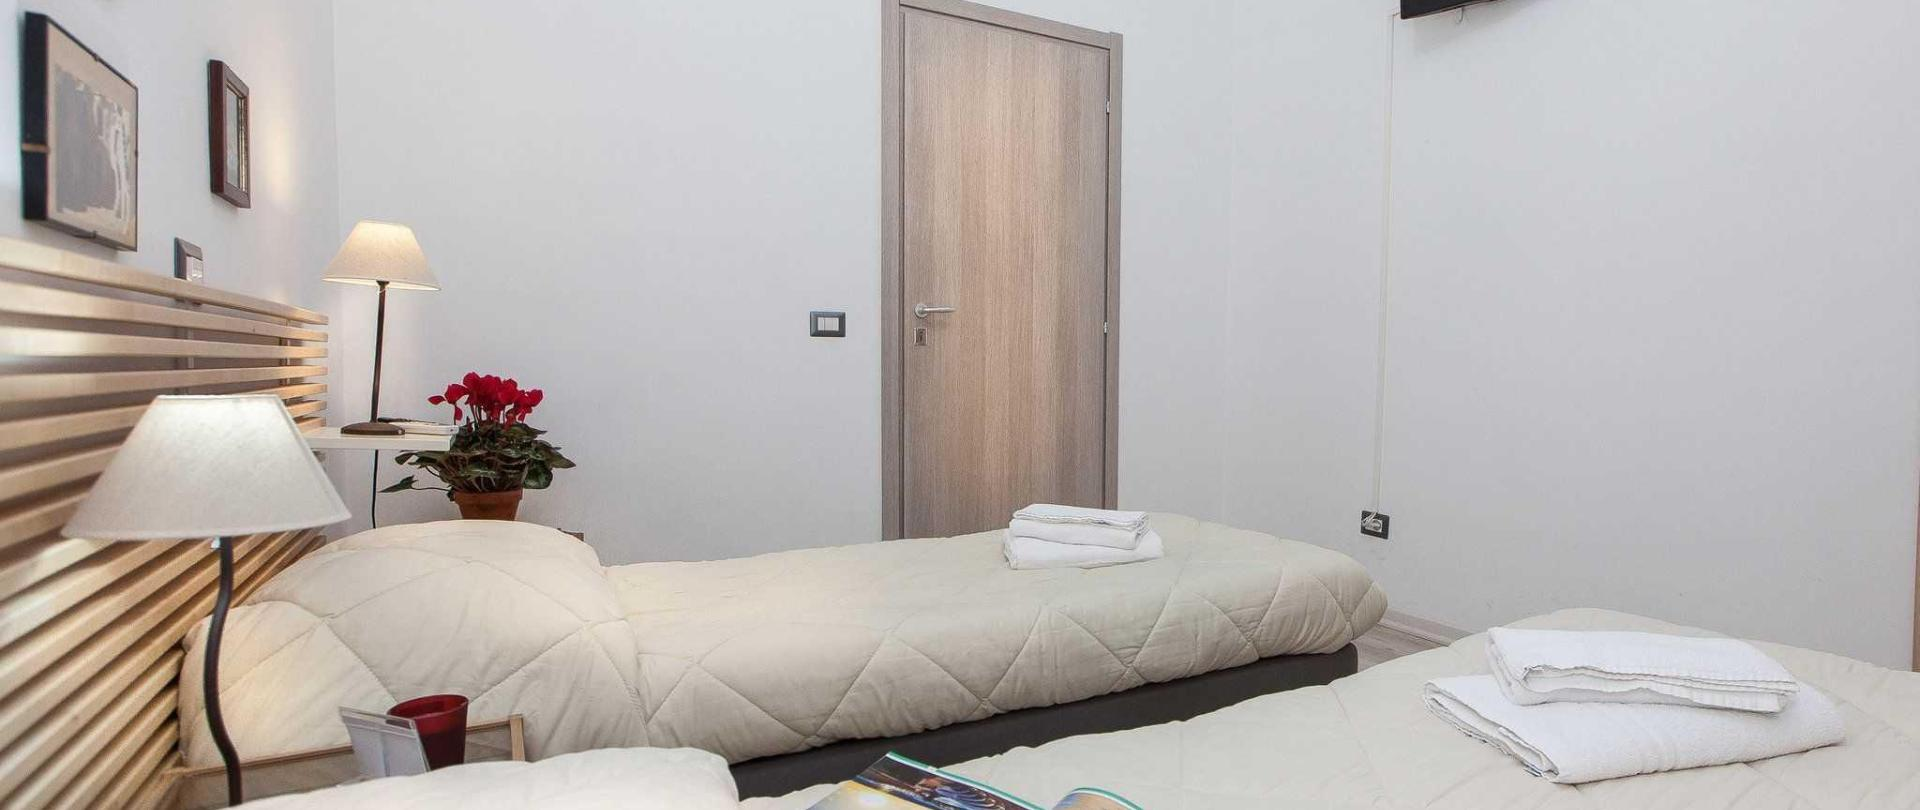 maison_dali_bad_breakfast_room-termini-11.jpg